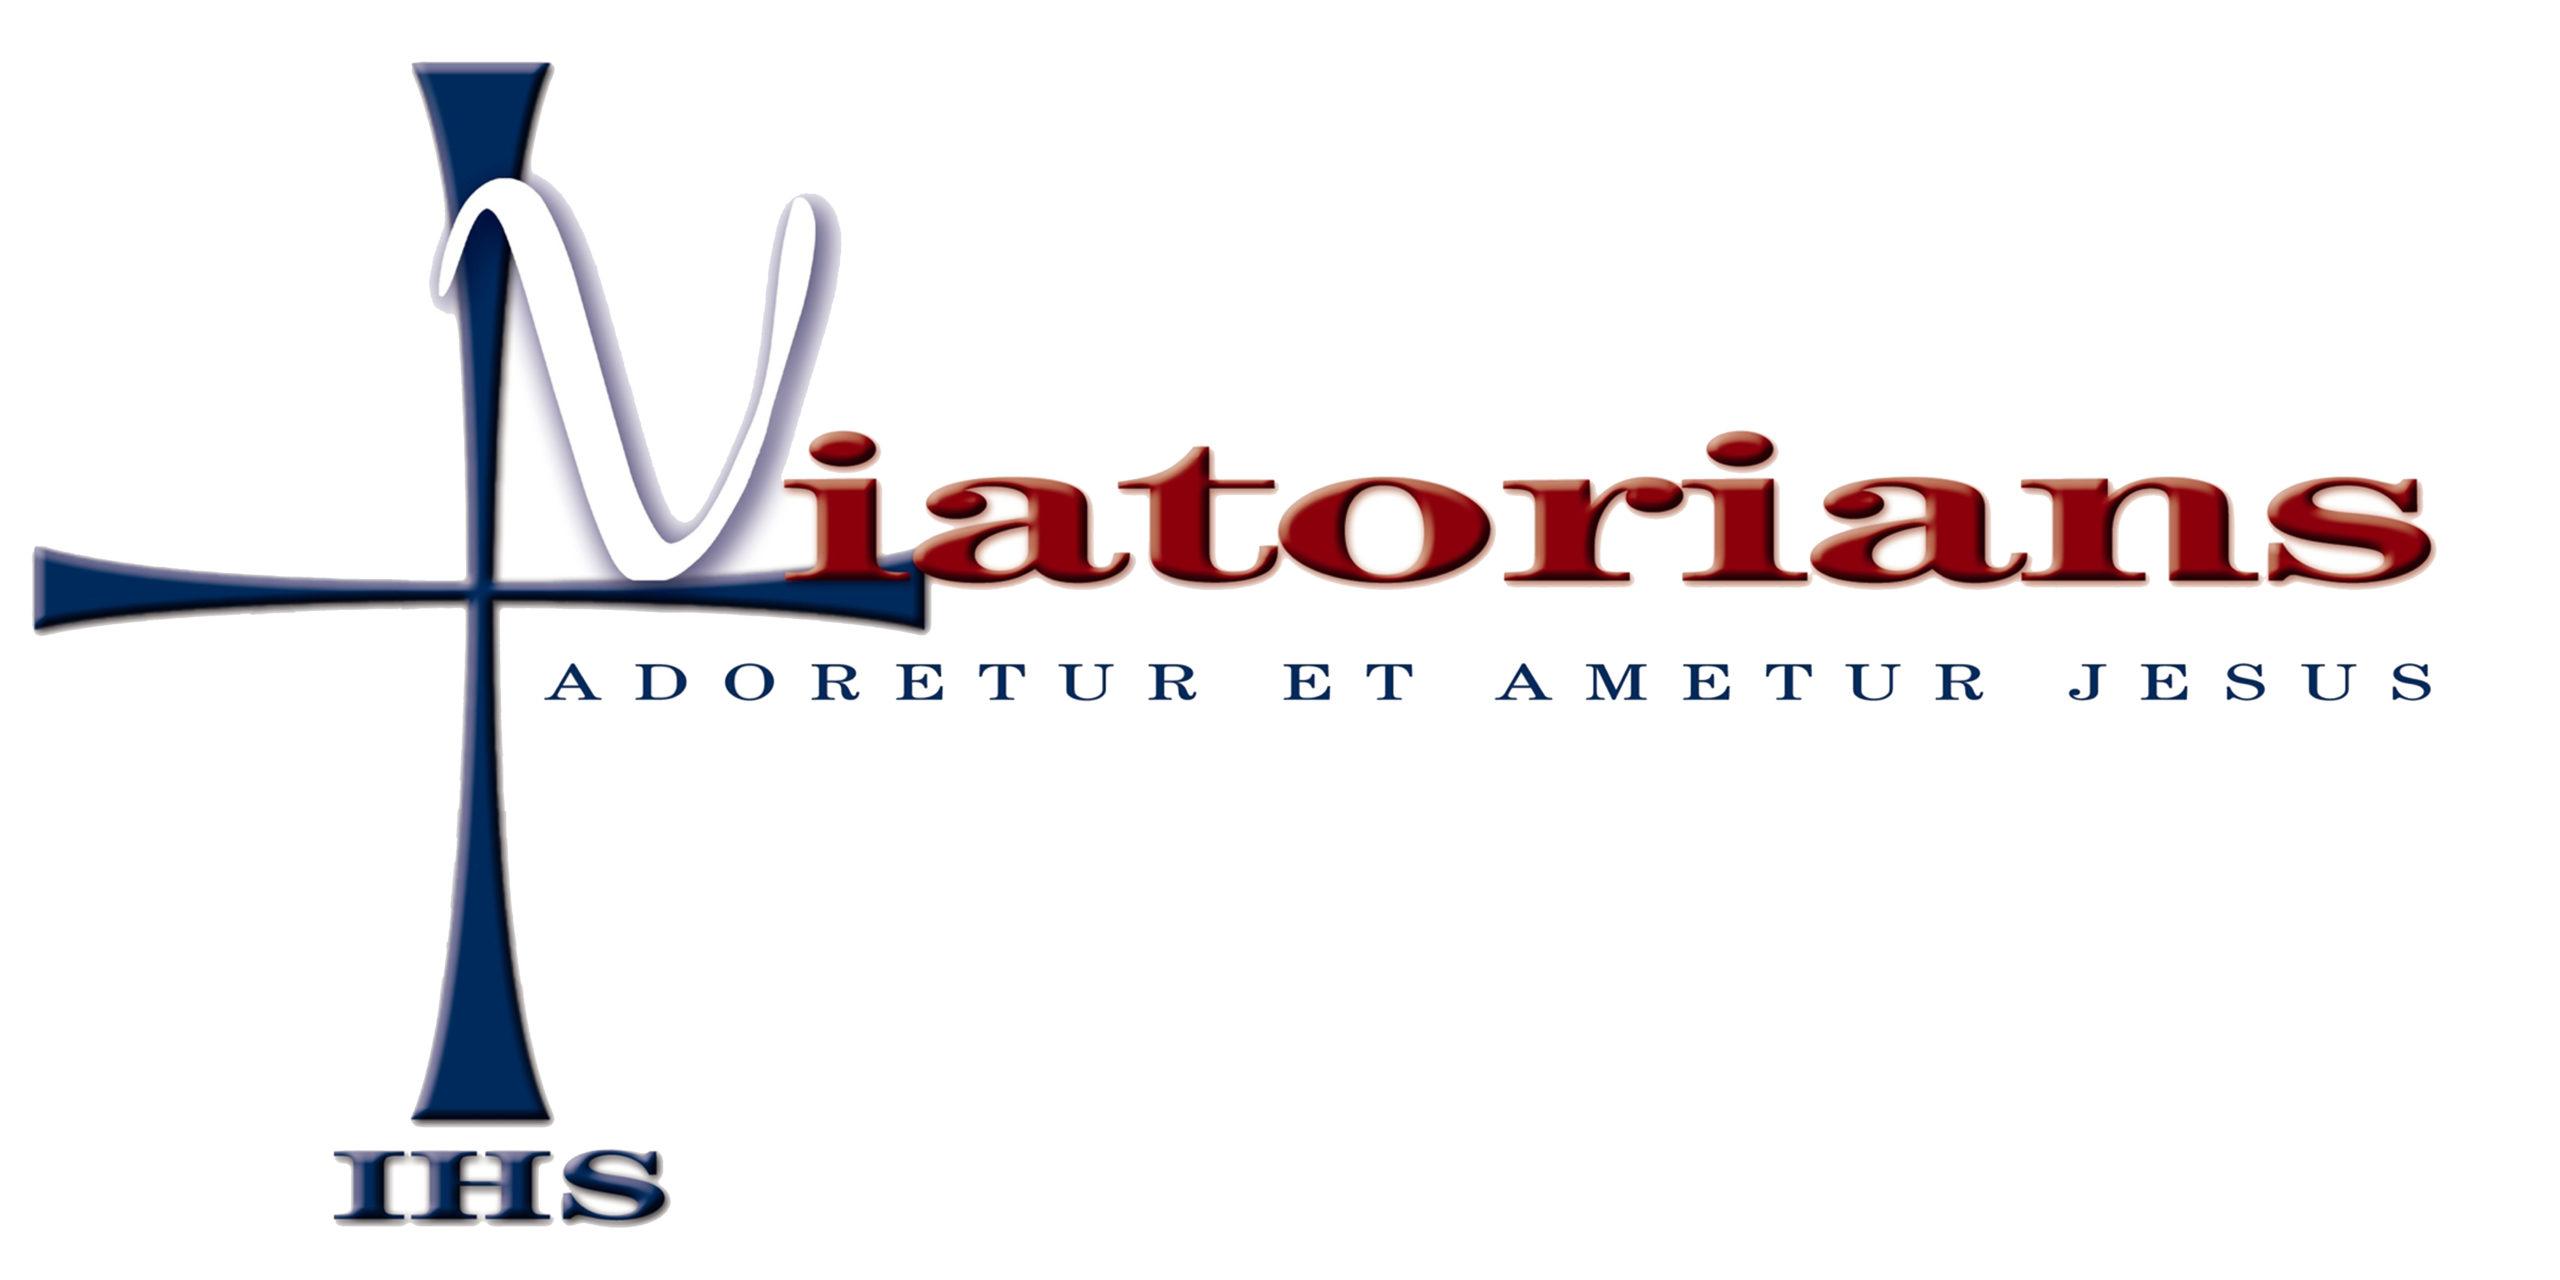 The Viatorian Community